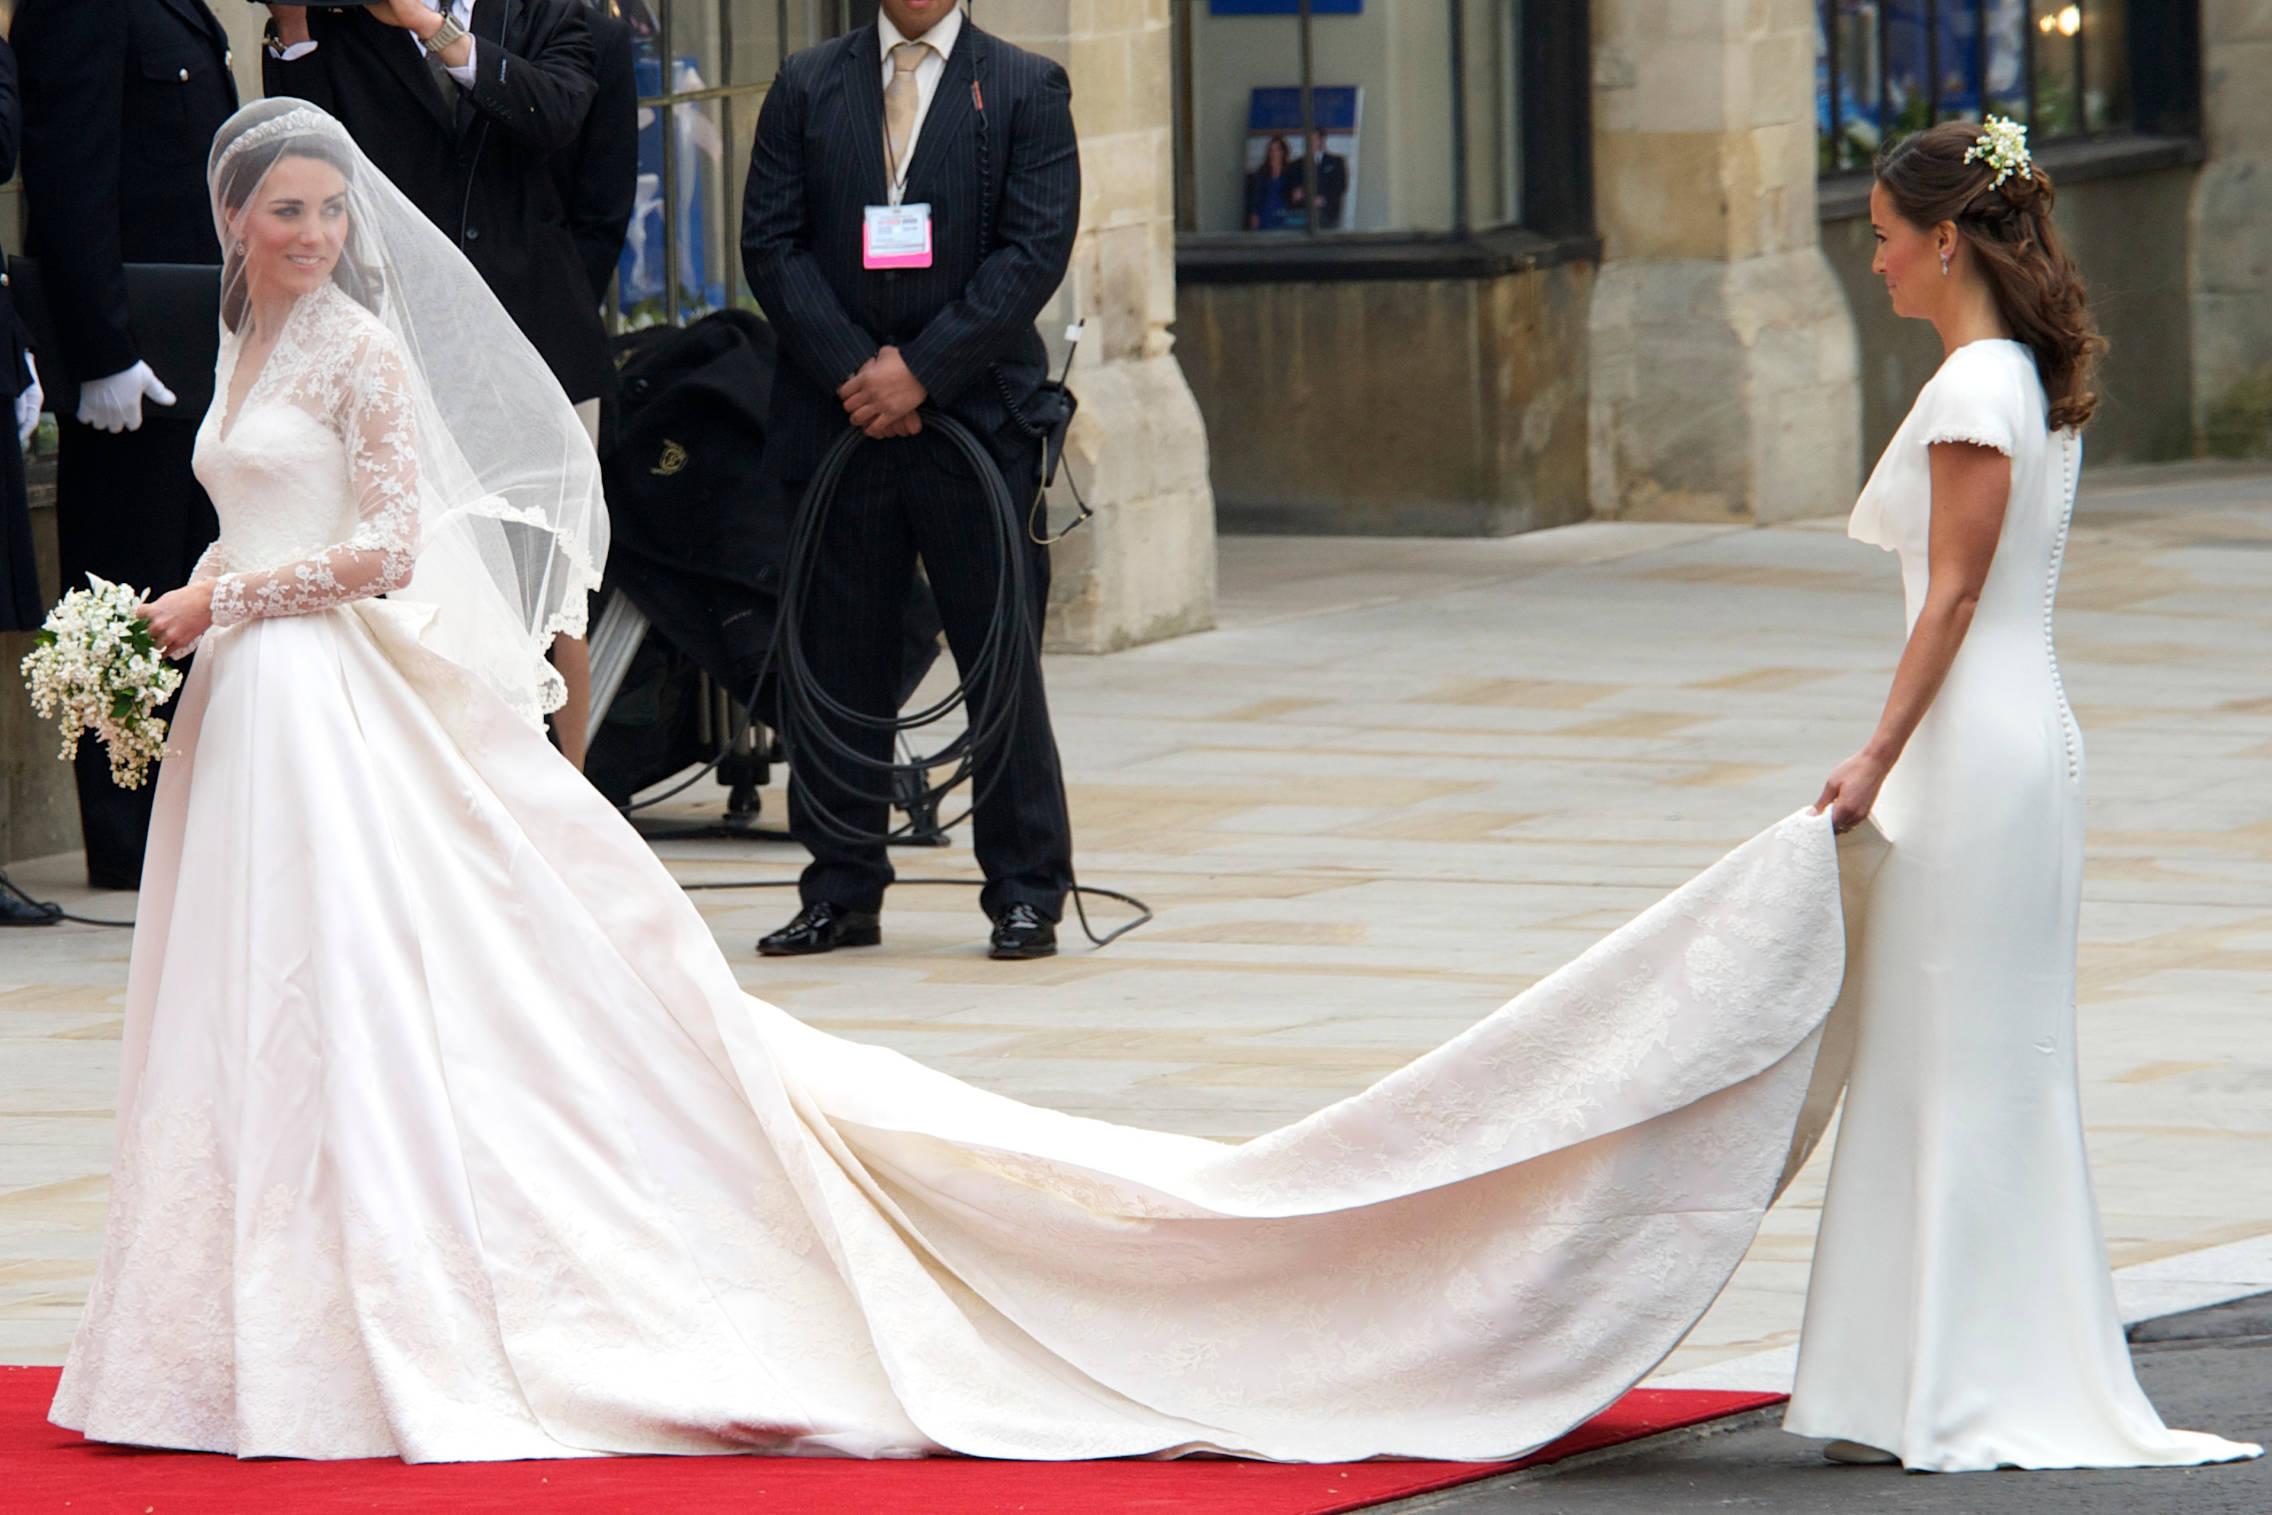 Kate y Pippa Middleton durante la boda de la primera. (Limited Pictures)